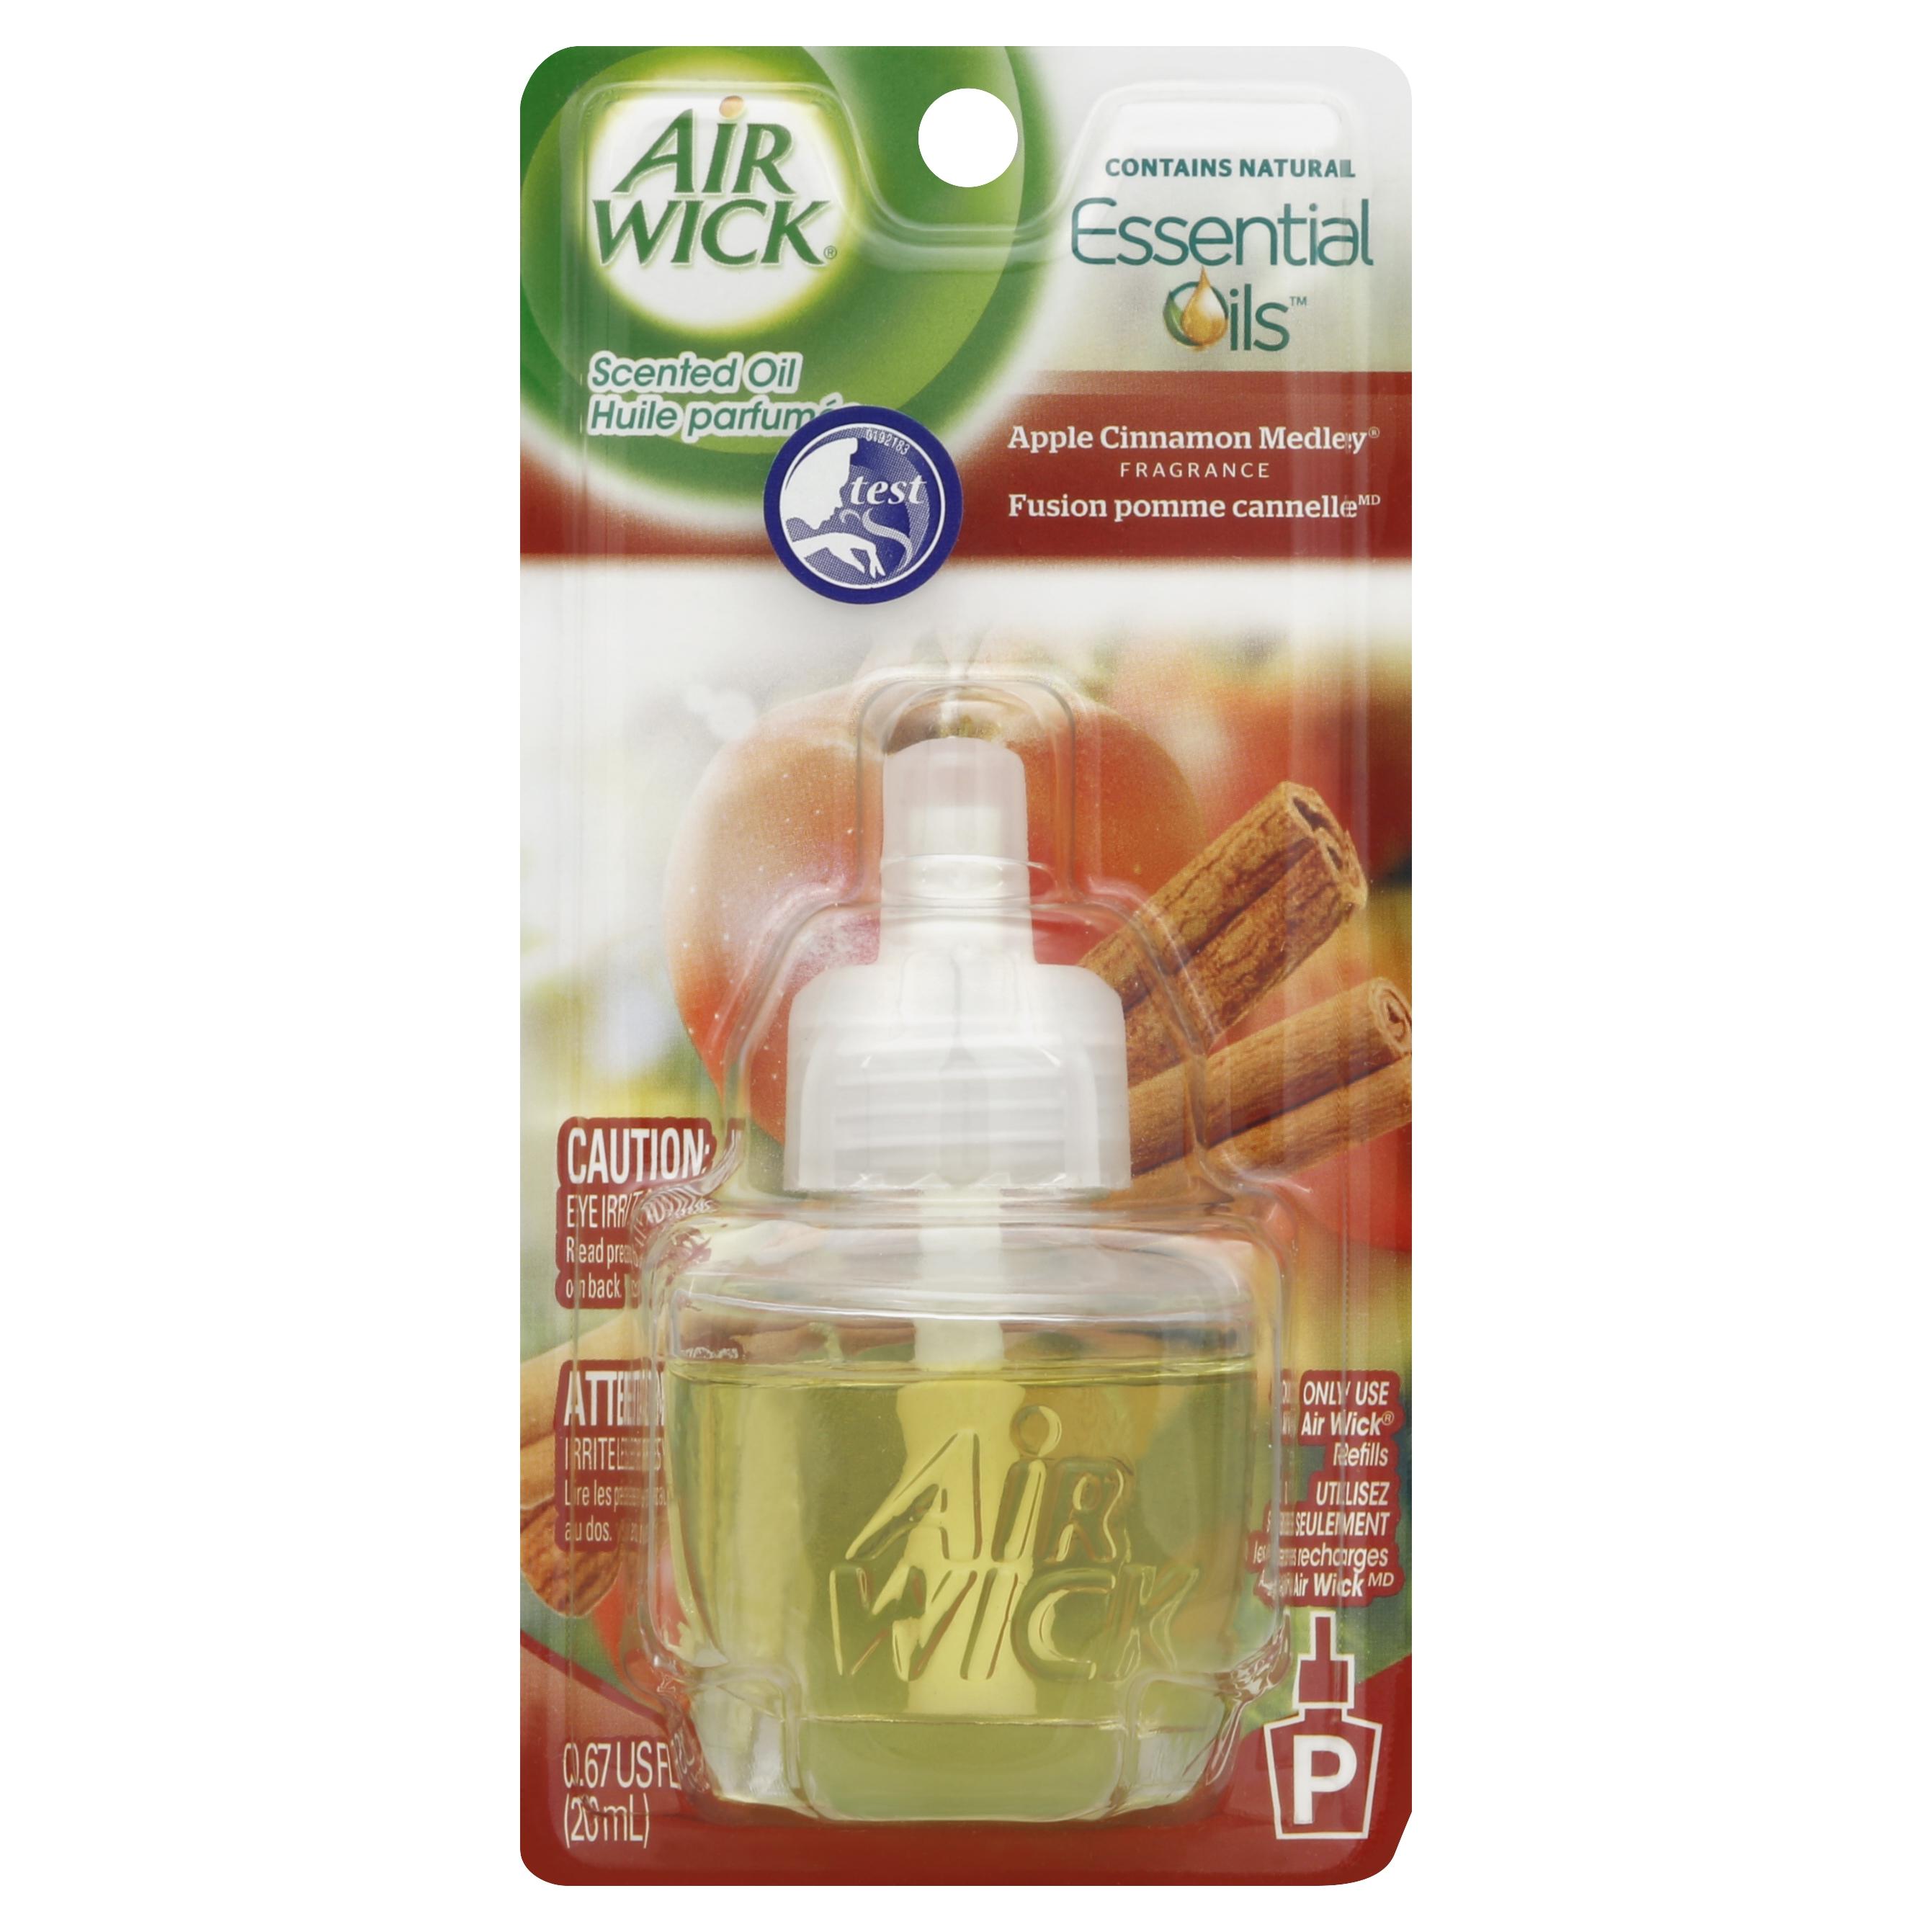 Image of Air Wick Aqua Essences Scented Oil Refill Apple Cinnamon Medley Scented Oil Refill Single, 1 ct